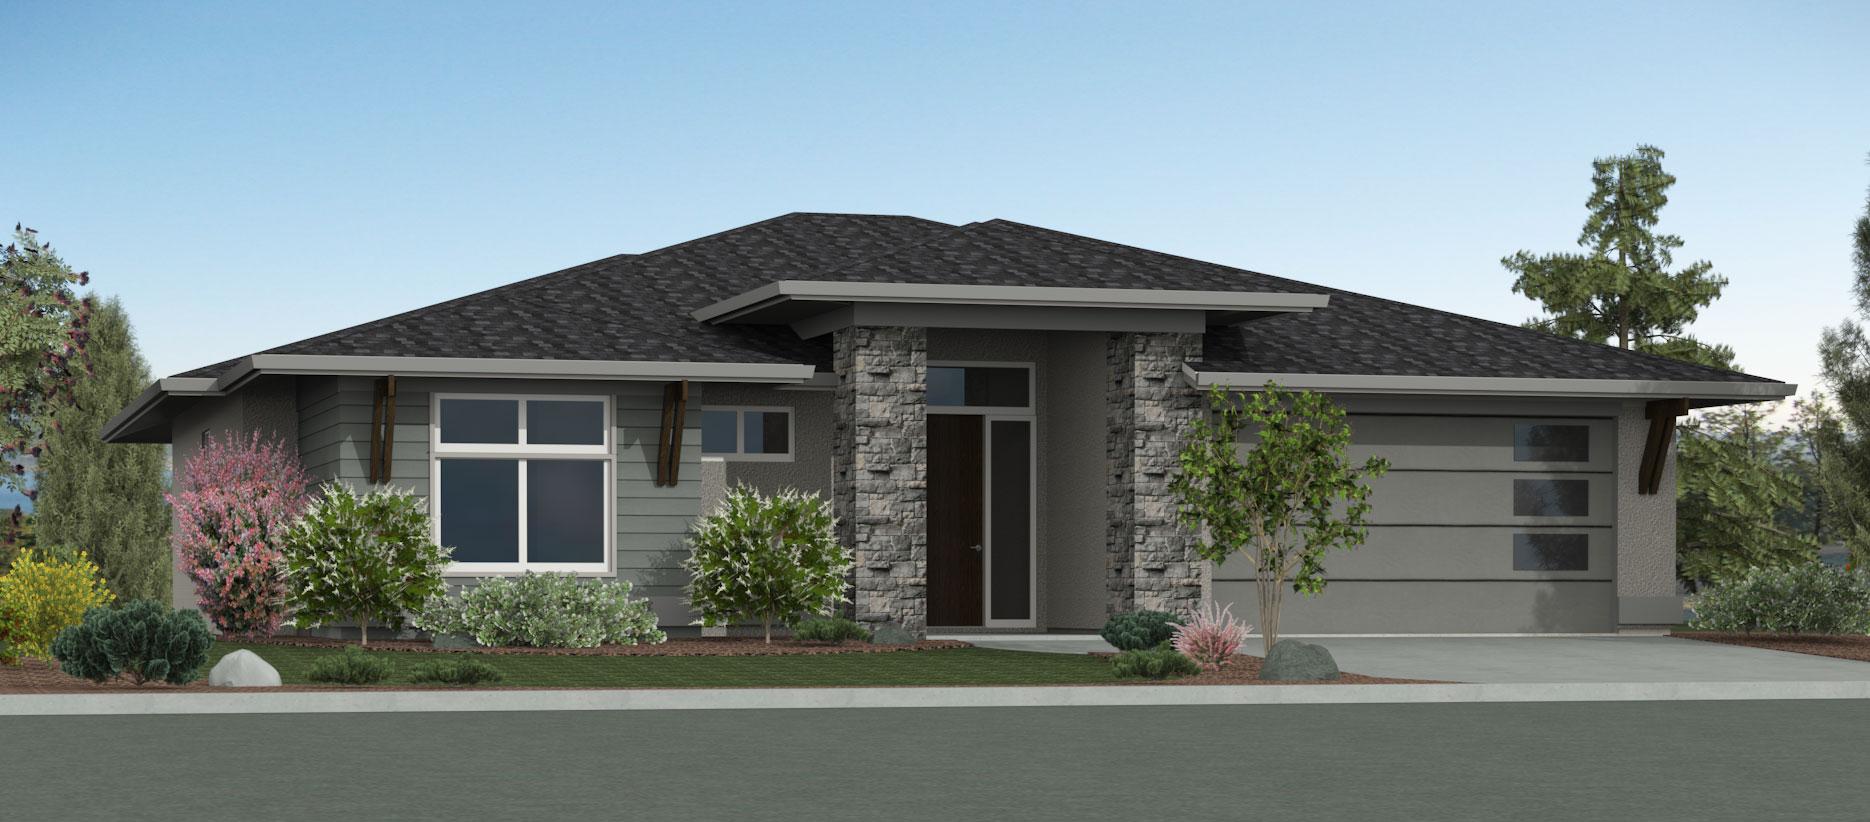 Tallus Ridge Spec Home Rykon Construction Project